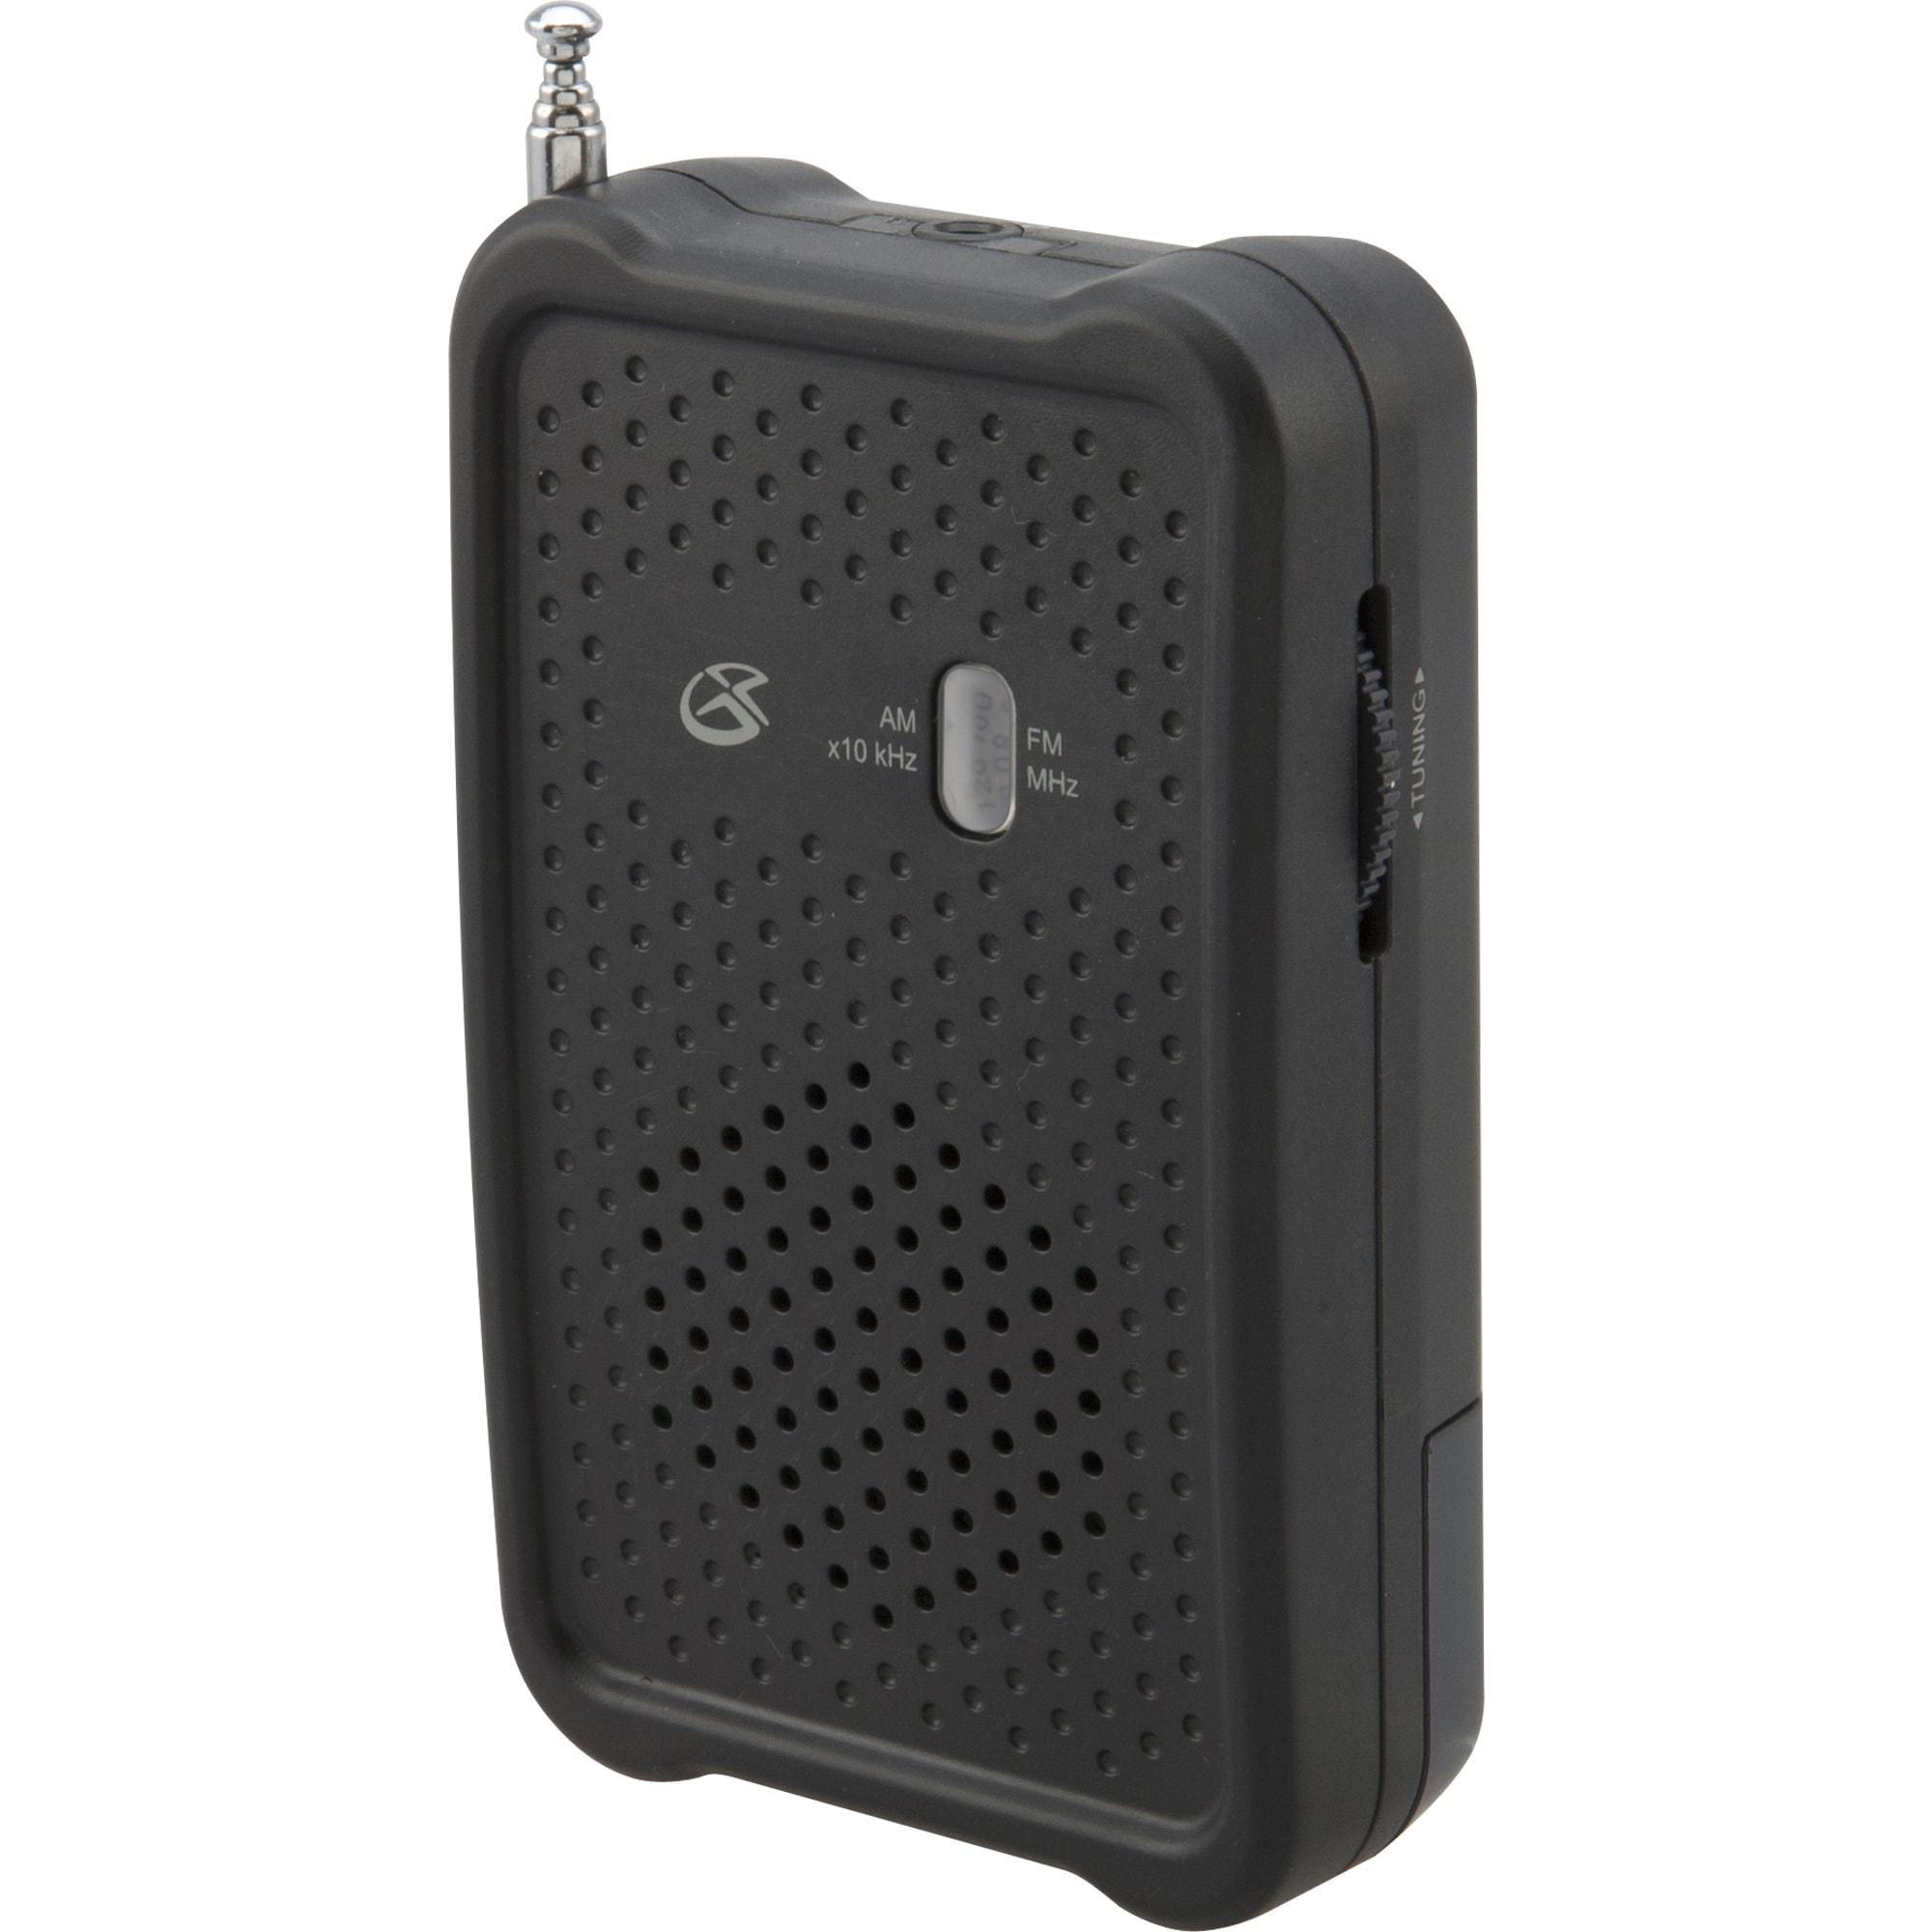 Digital Products International RO55B Black AM/FM Handheld...